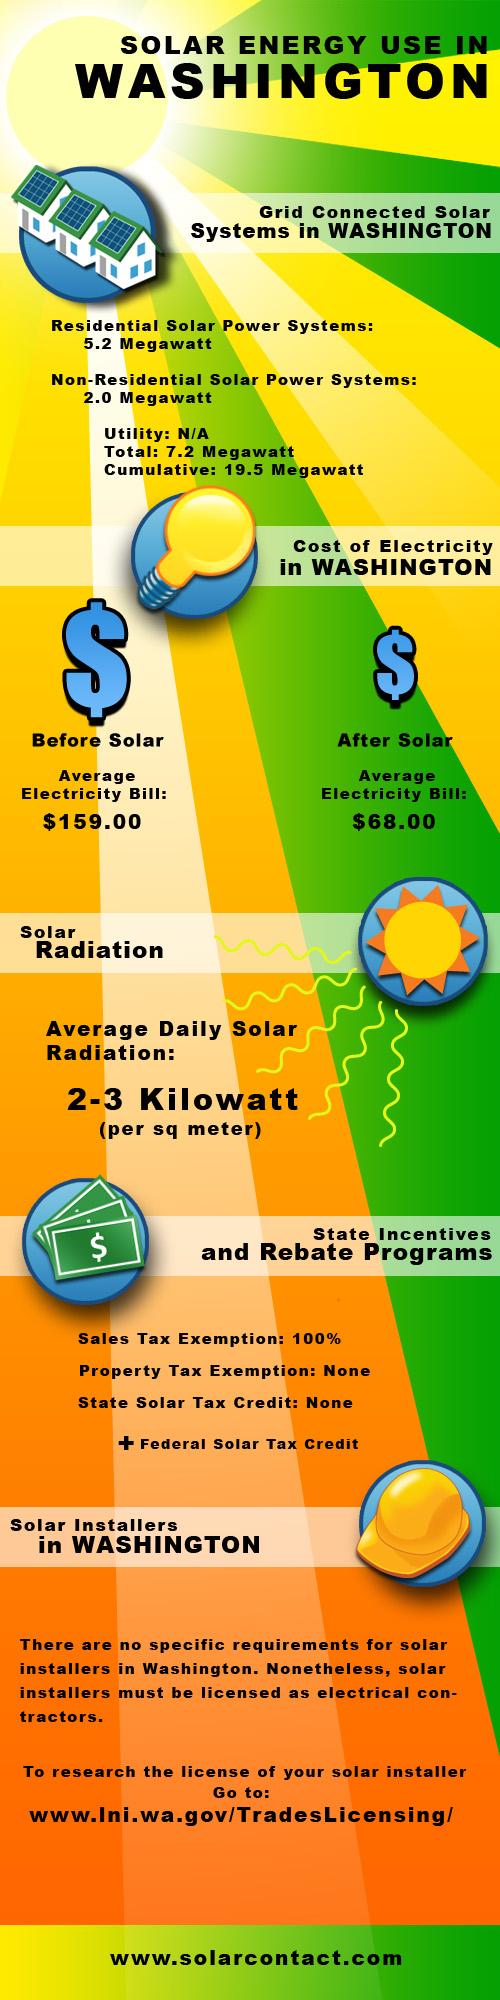 Fact Sheet Solar Energy Use in Washington D.C